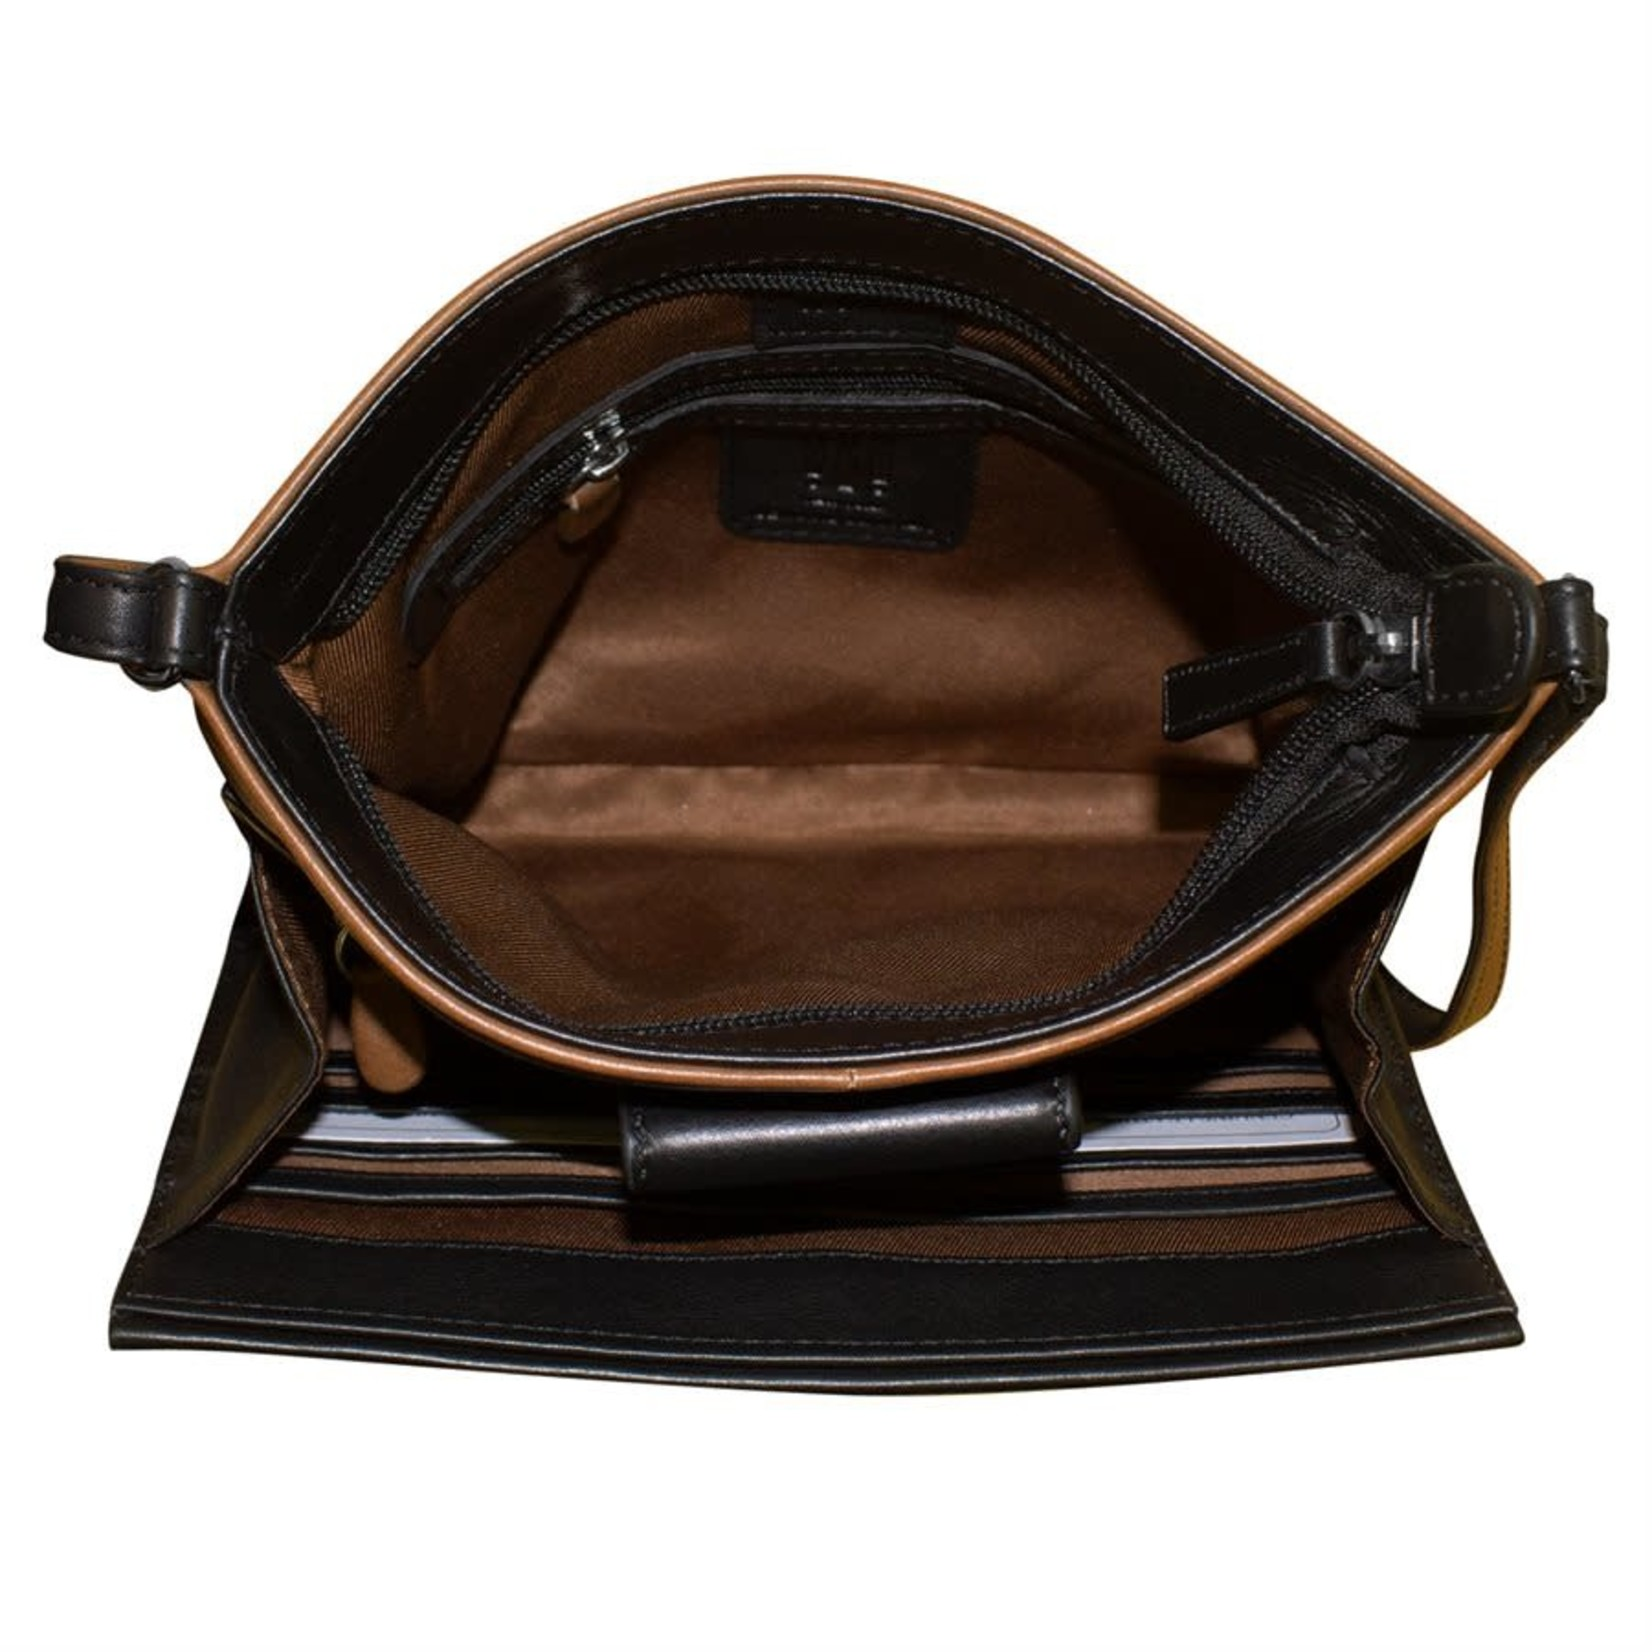 Leather Handbags and Accessories 6592 Toffee/Black - Organizer Crossbody